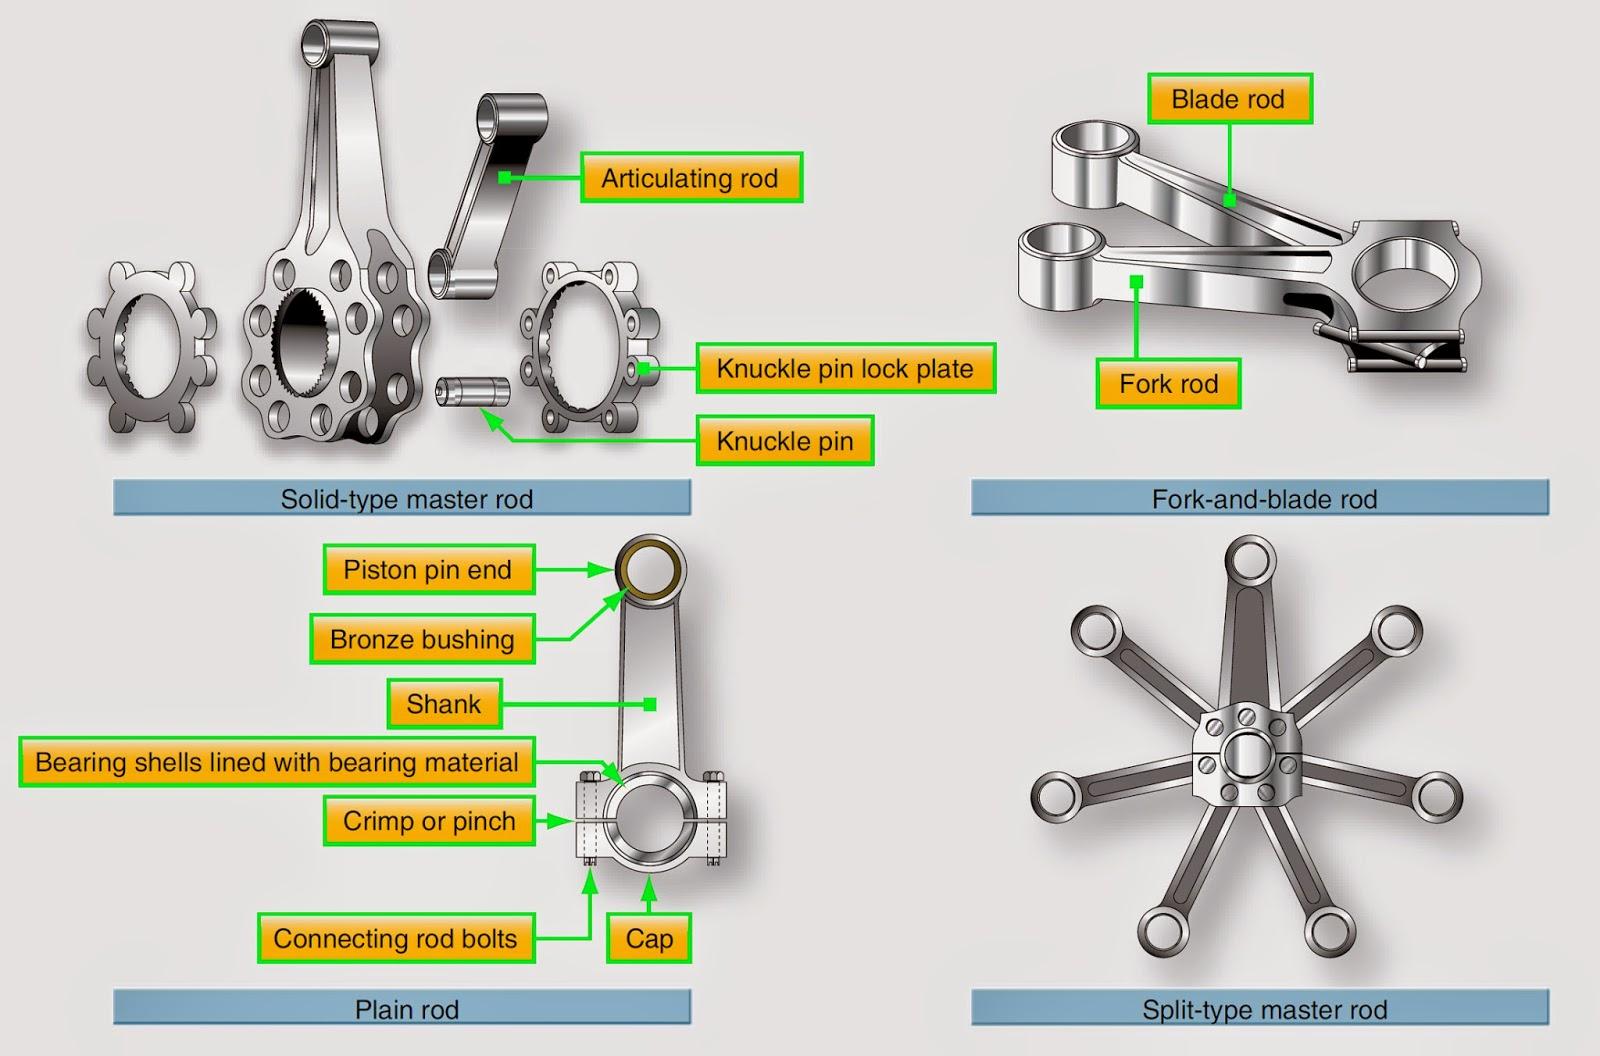 suzuki forenza wiring diagram suzuki forenza o2 sensor